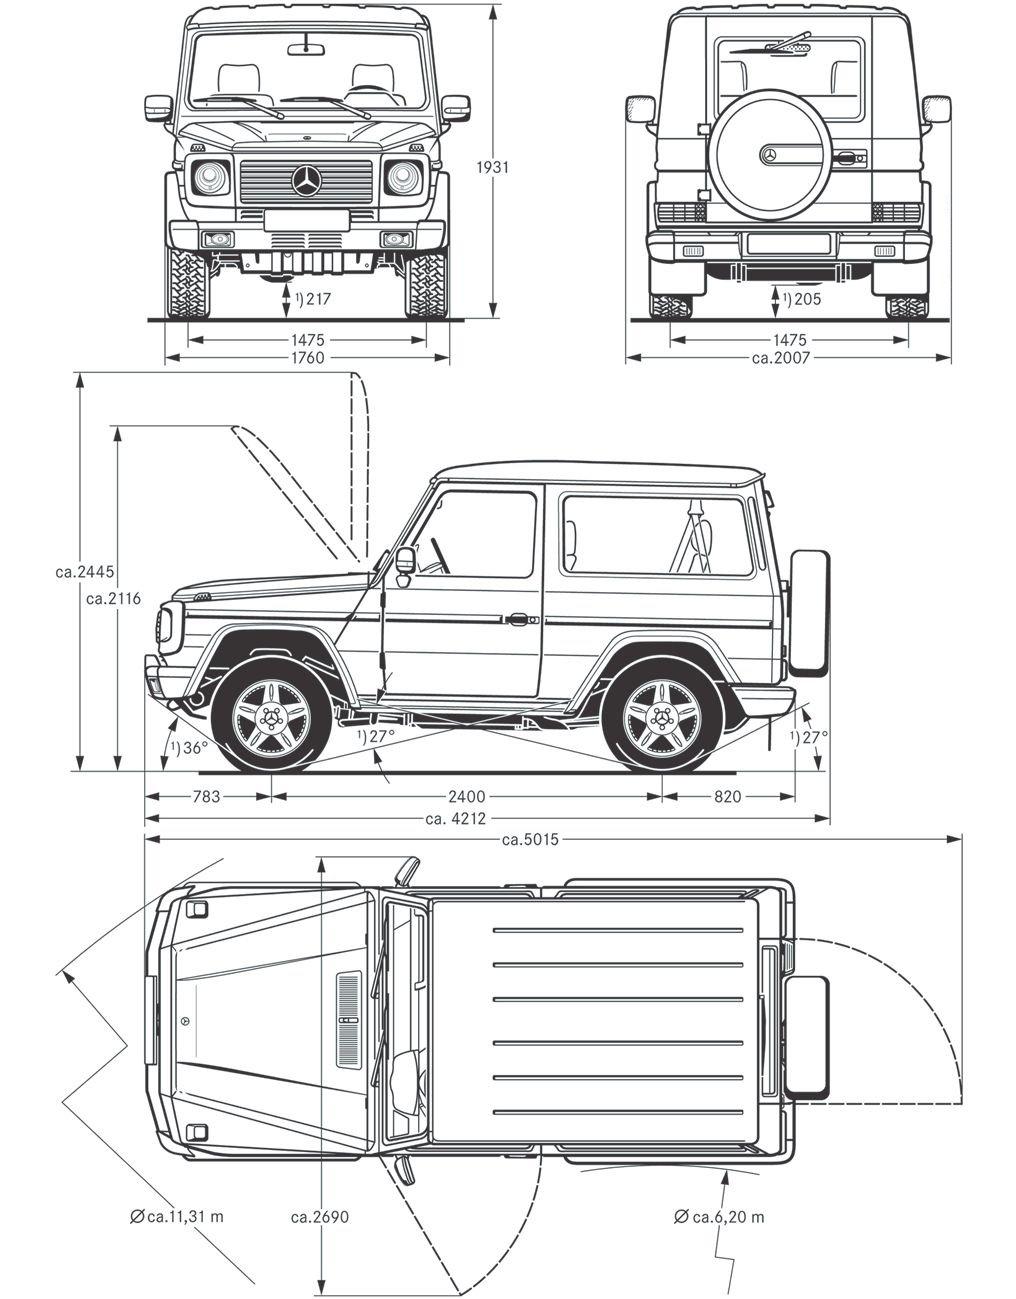 [Mercedes Classe G 463] Dimensions (Page 1) / Classe G 460